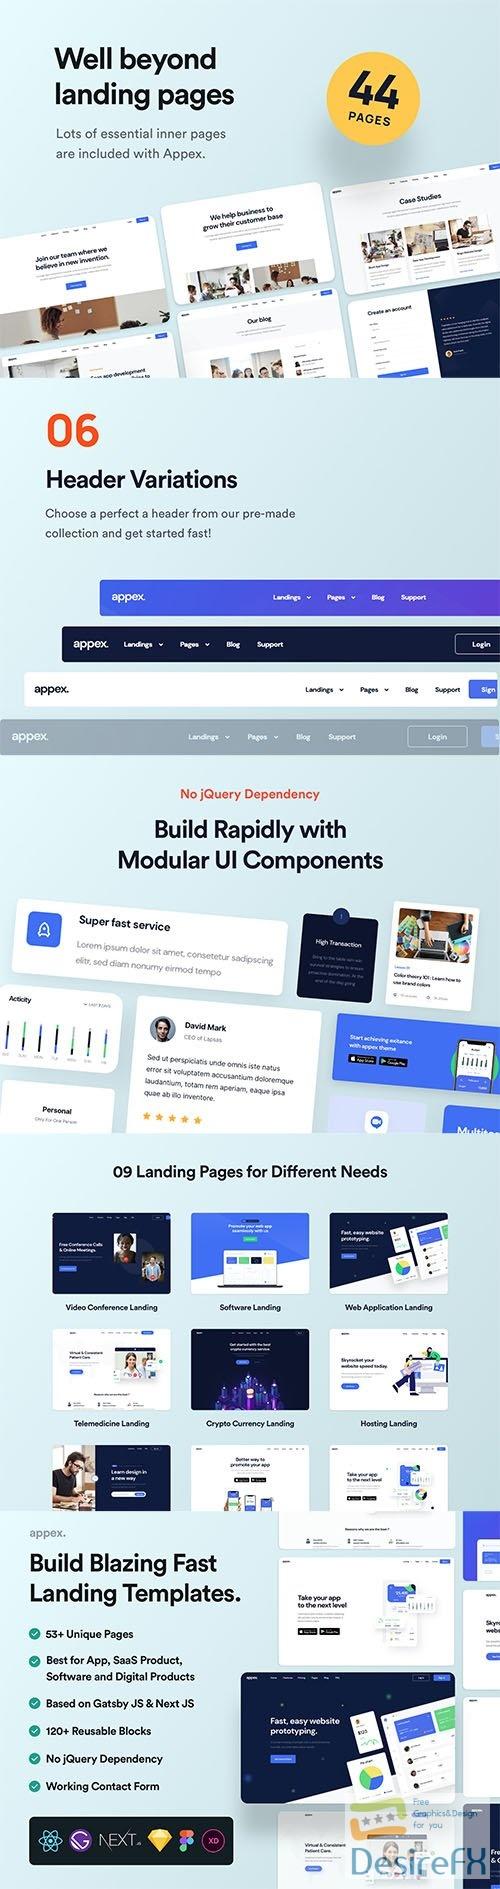 Sandar - React Landing Page Template - UI8